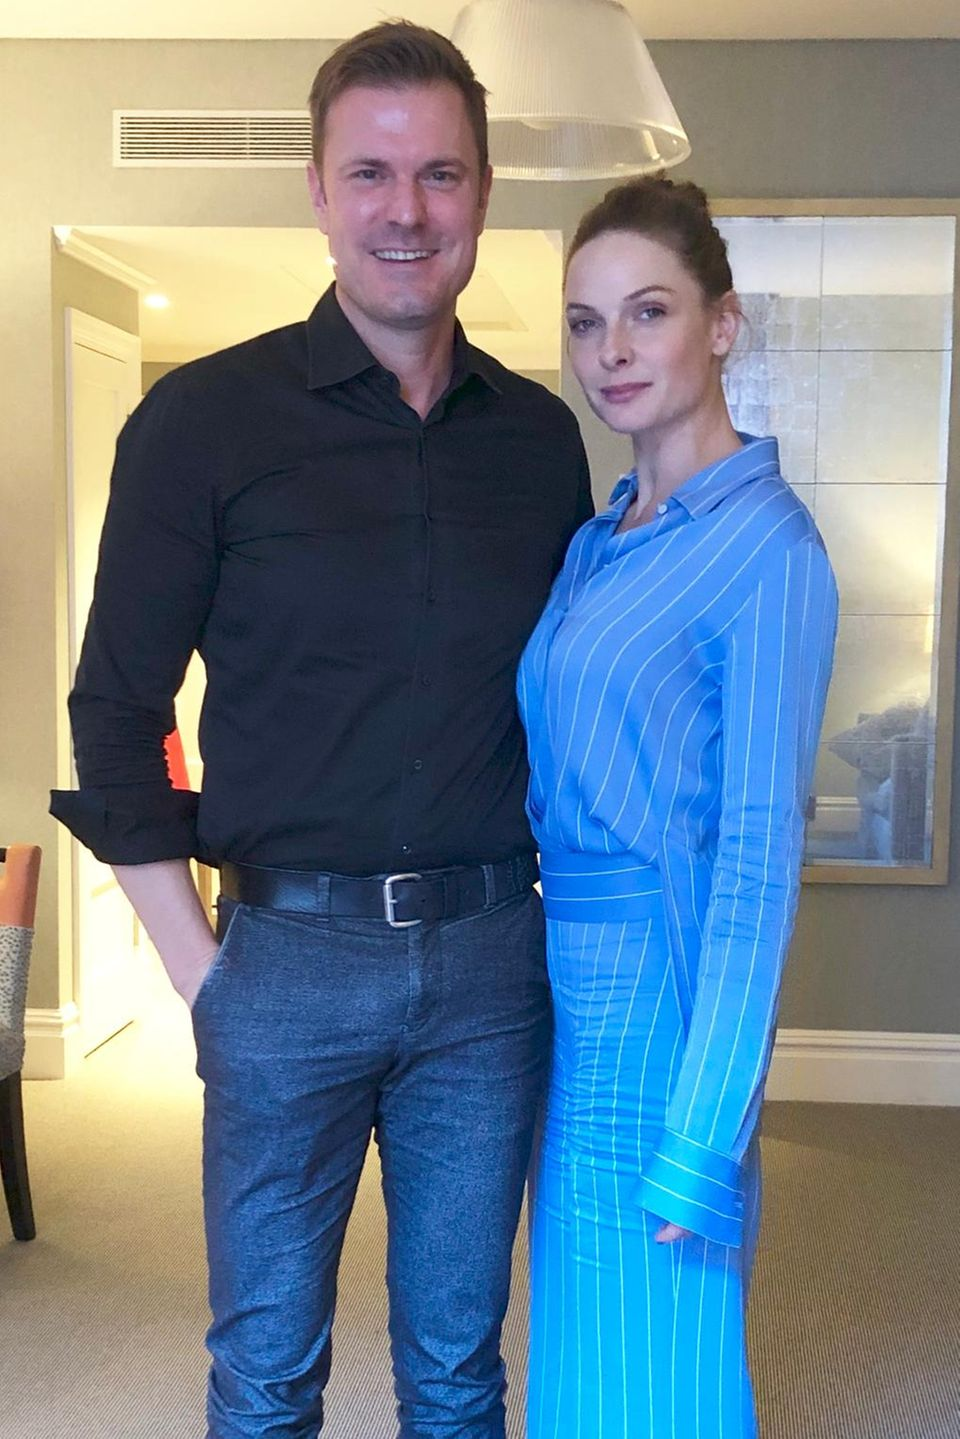 Alexander Nebe führte das Interview mitRebecca Ferguson im Soho Hotelin London.